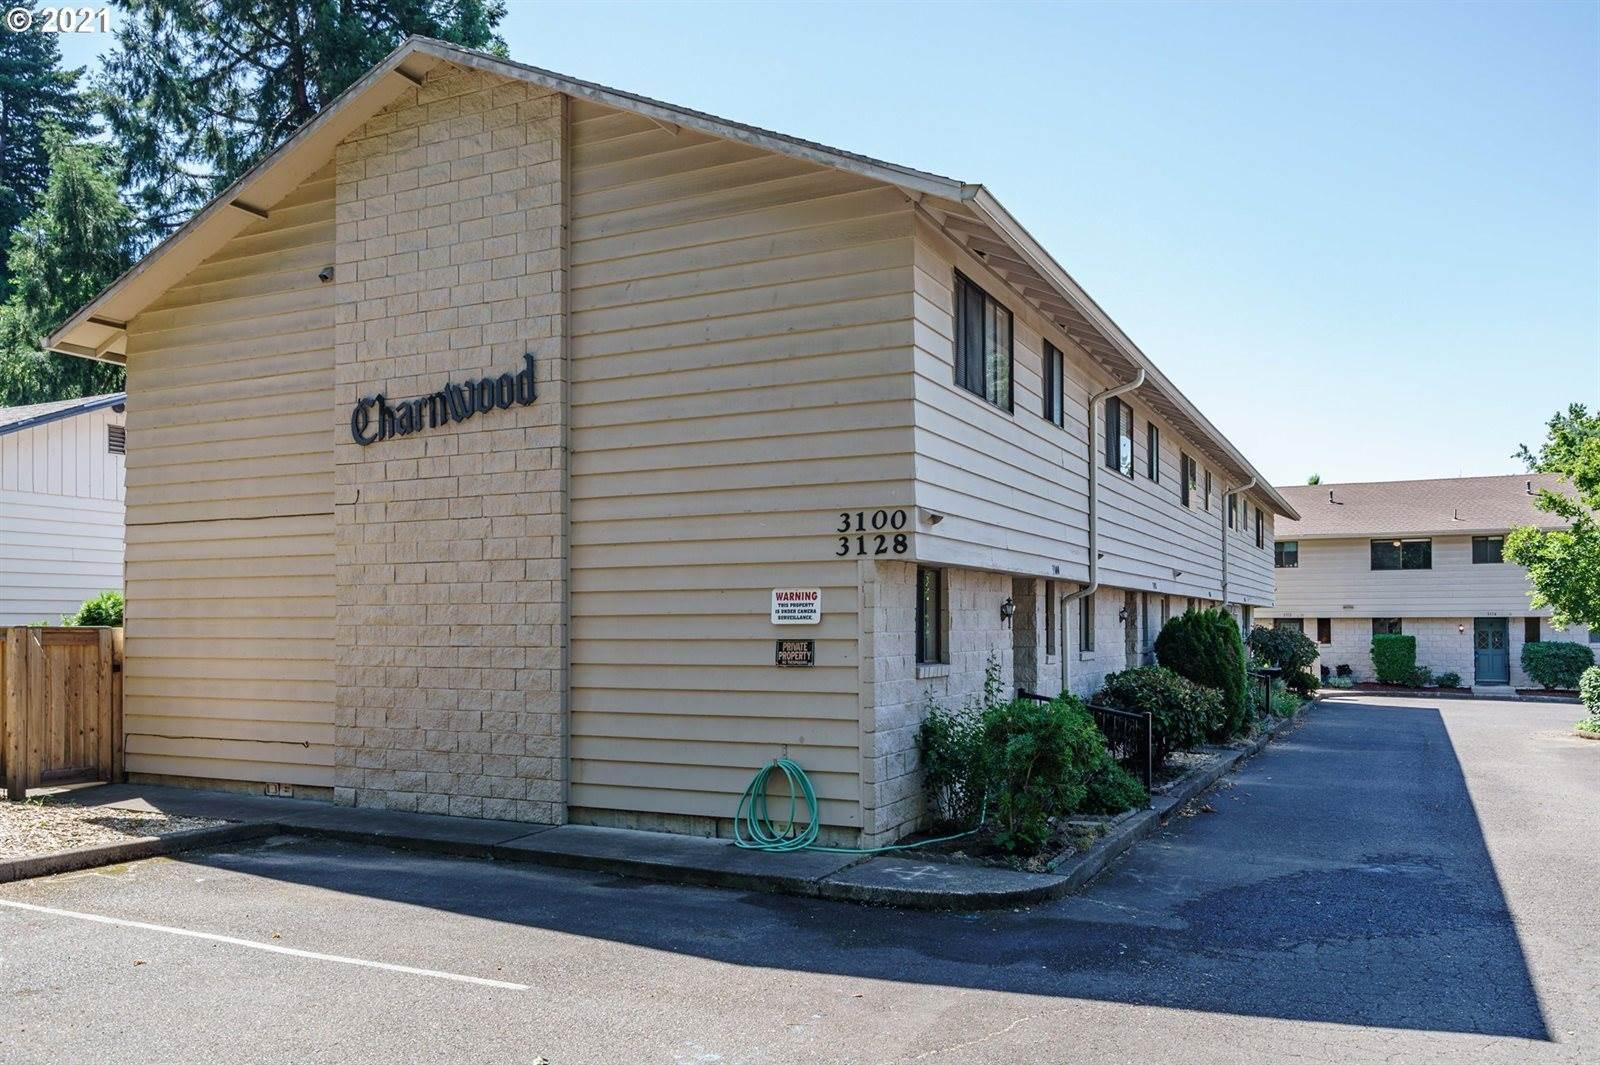 3114 SE Chestnut St, Milwaukie, OR 97267